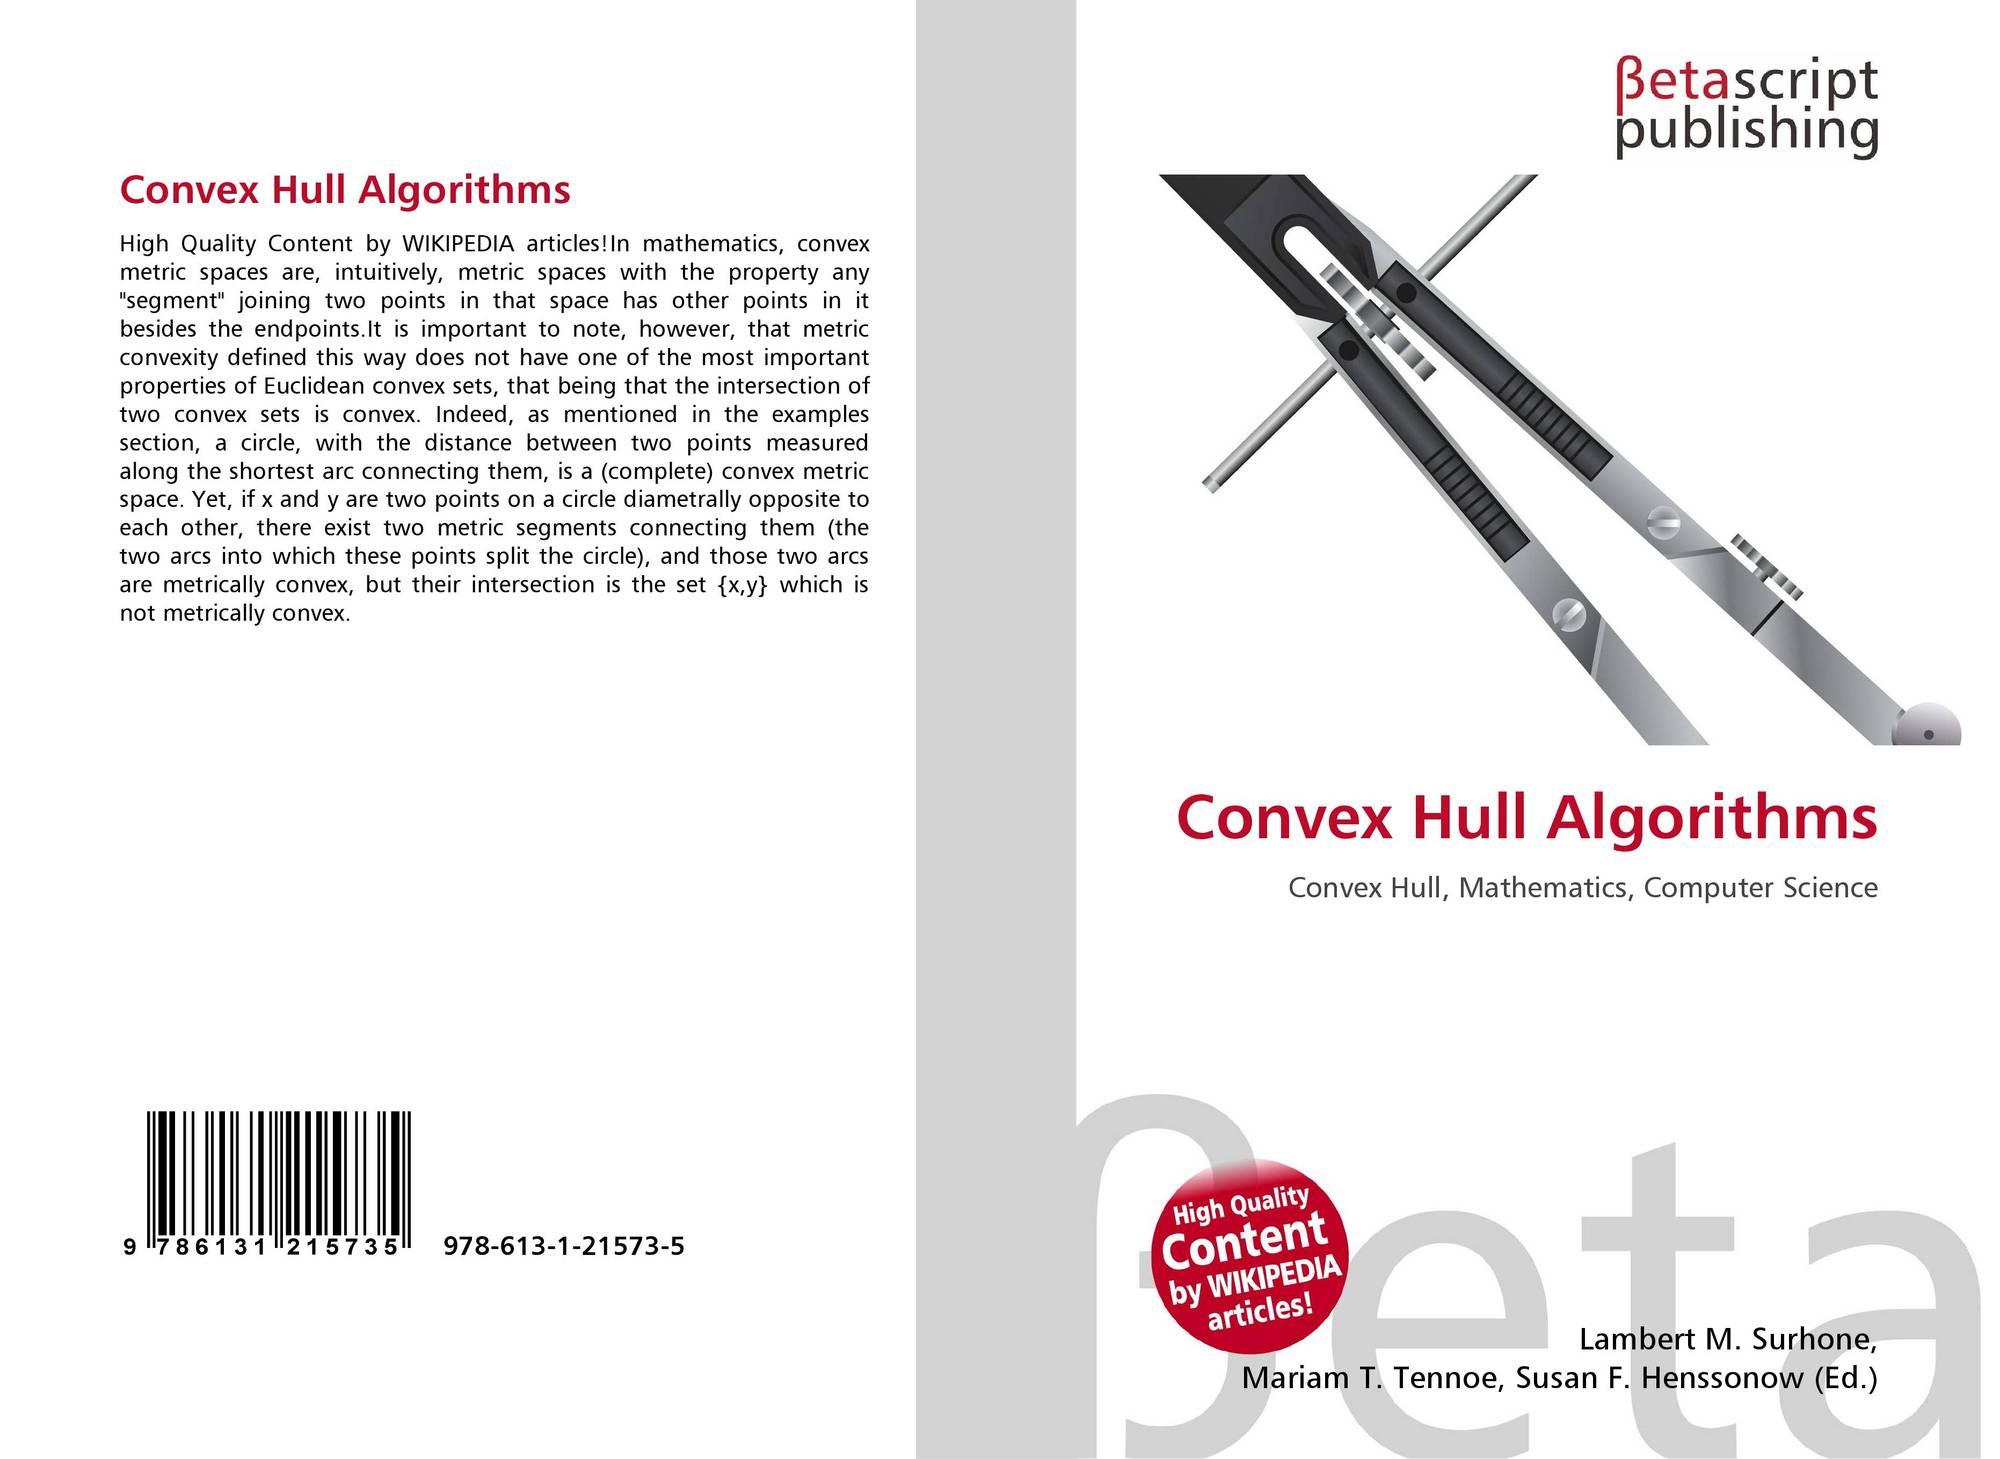 Convex Hull Algorithms, 978-613-1-21573-5, 6131215731